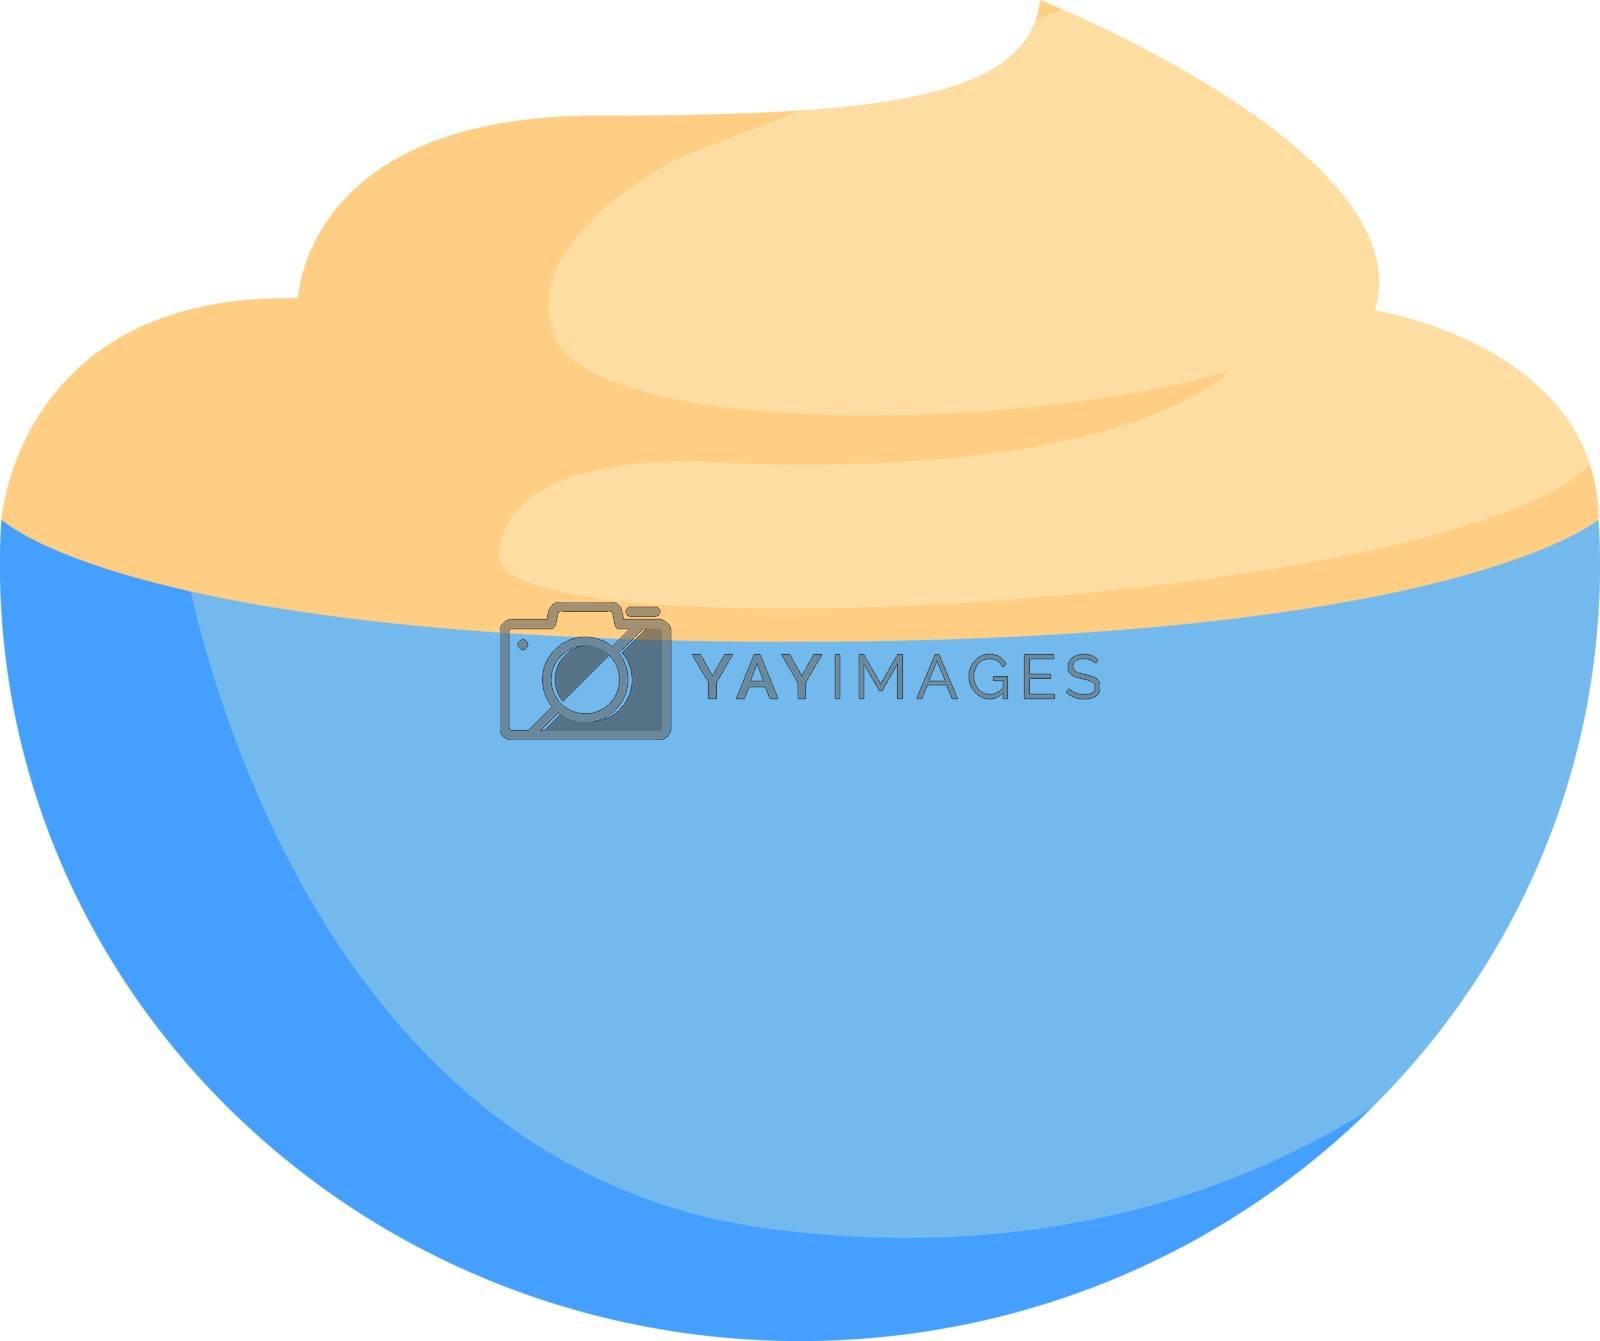 Sour cream, illustration, vector on white background.